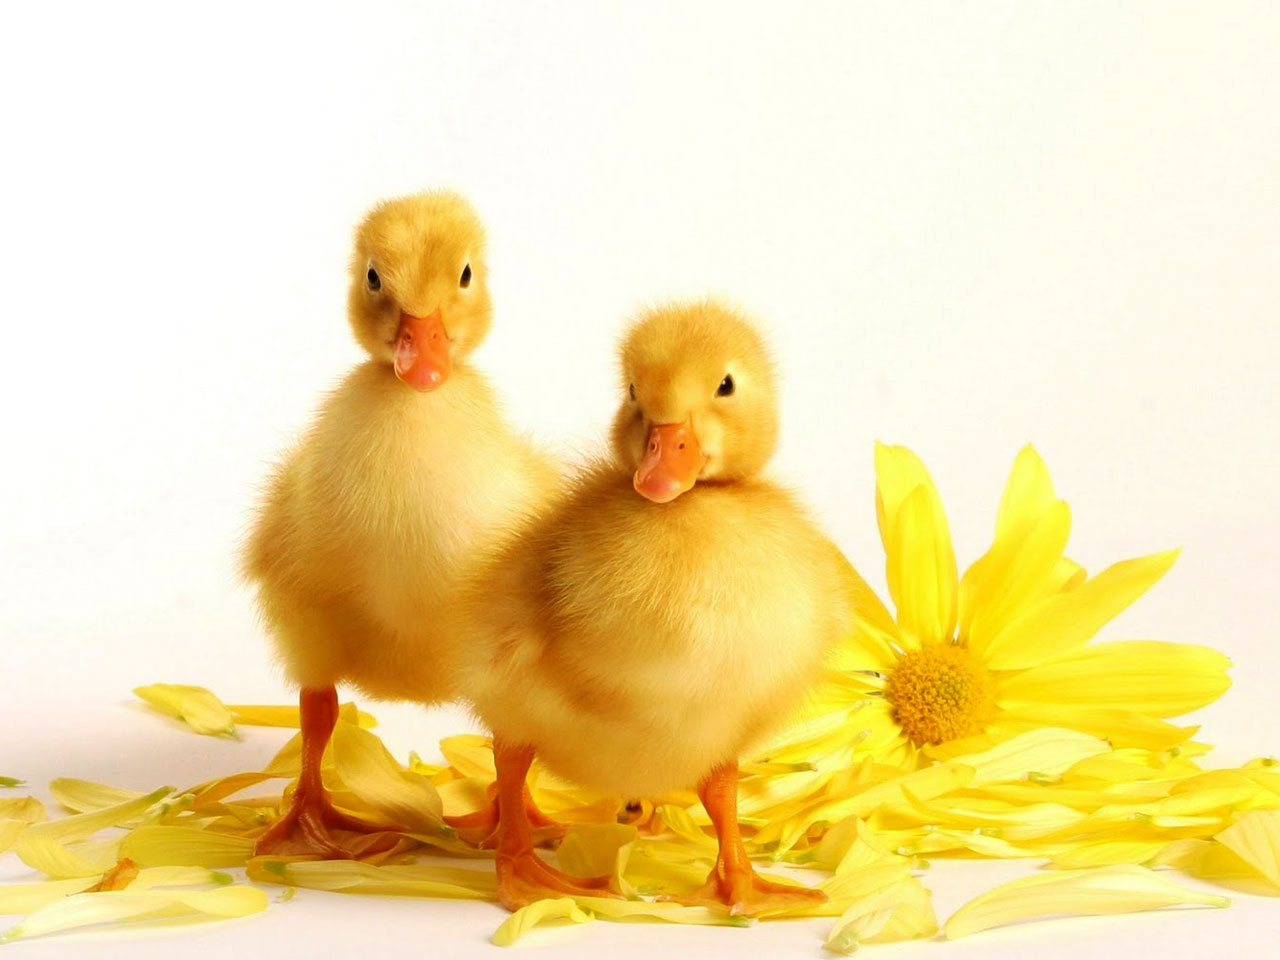 Baby Duck Wallpaper 13937 1280x960 px HDWallSourcecom